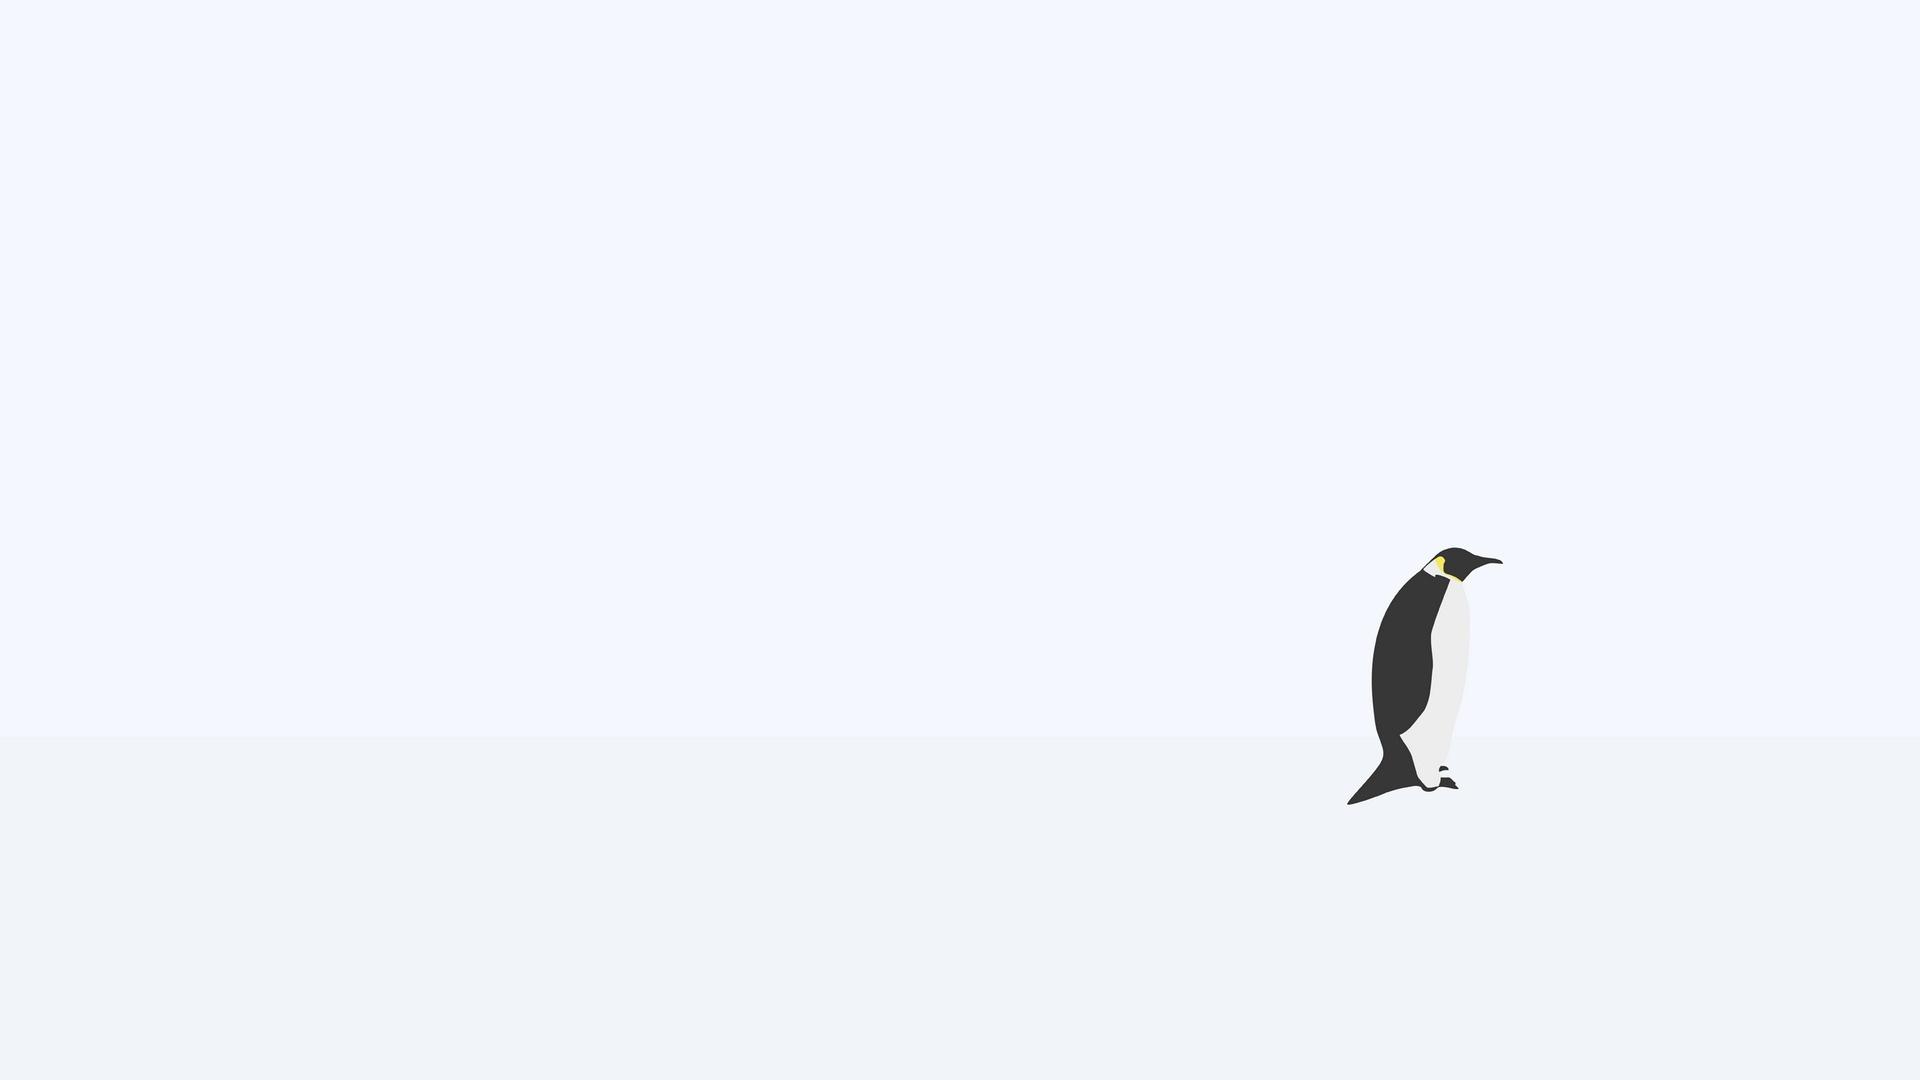 Must see Wallpaper Bird Minimalist - penguin_minimalism_snow_66189_1920x1080  Pictures_35270.jpg